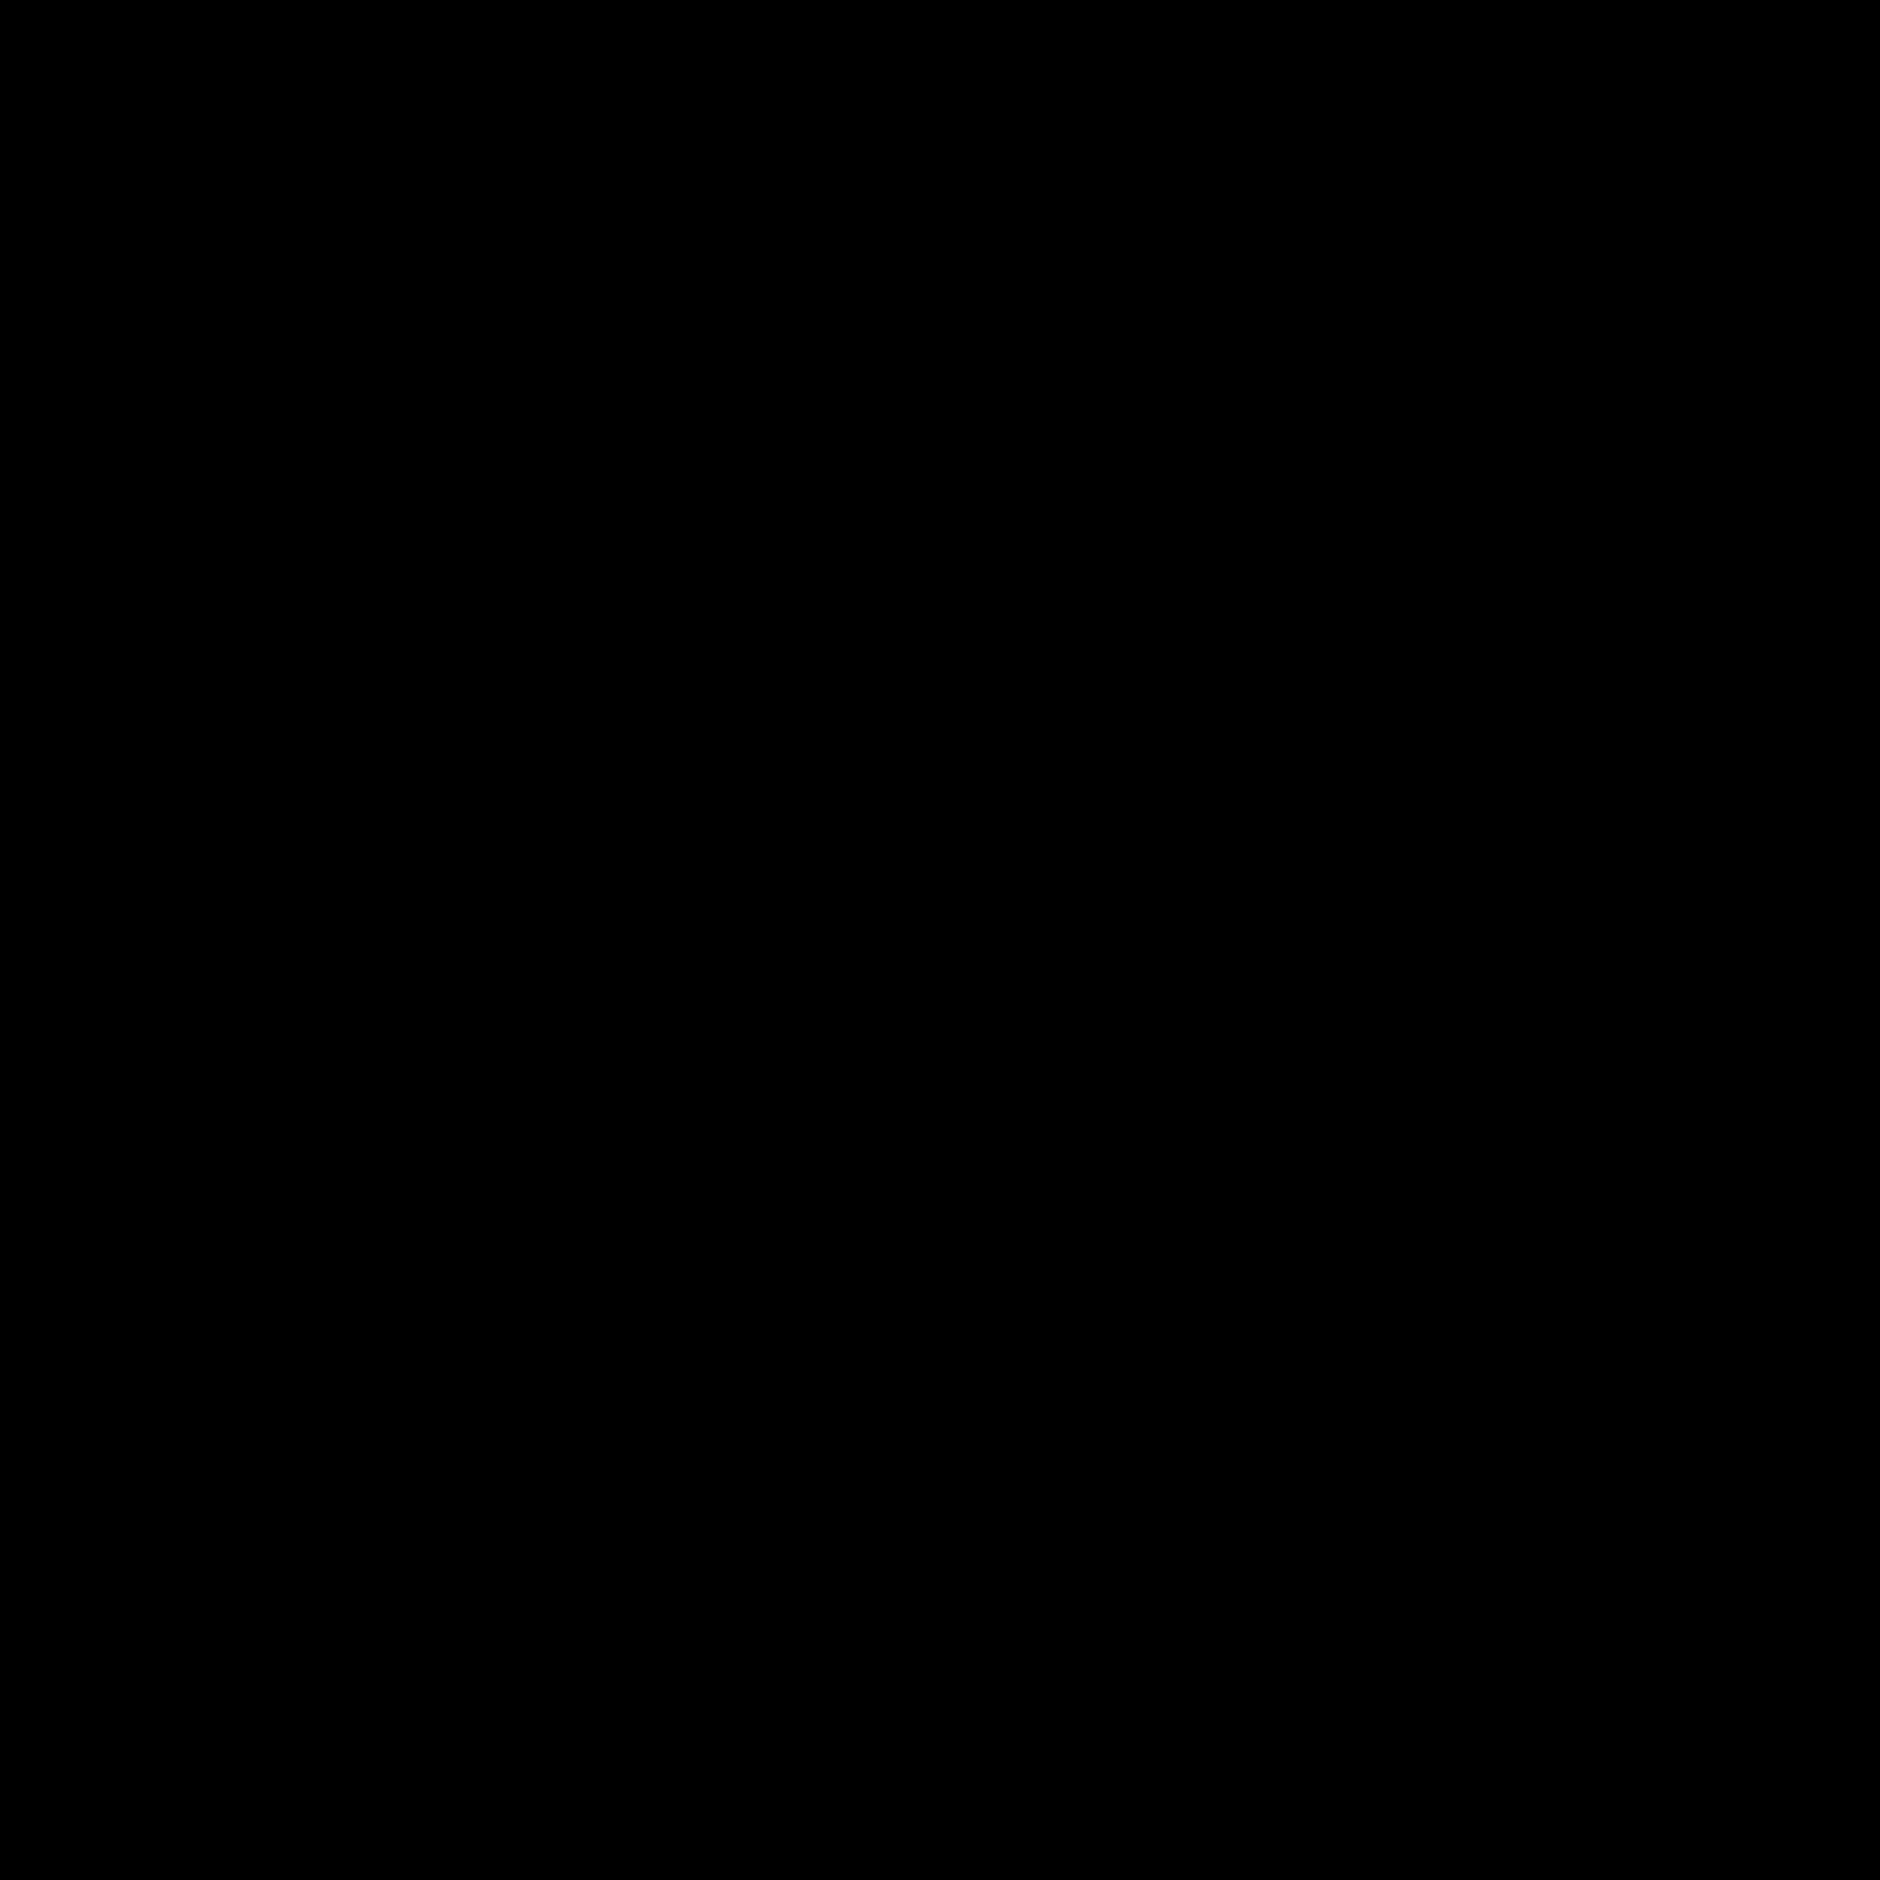 arigatou-no-katachi